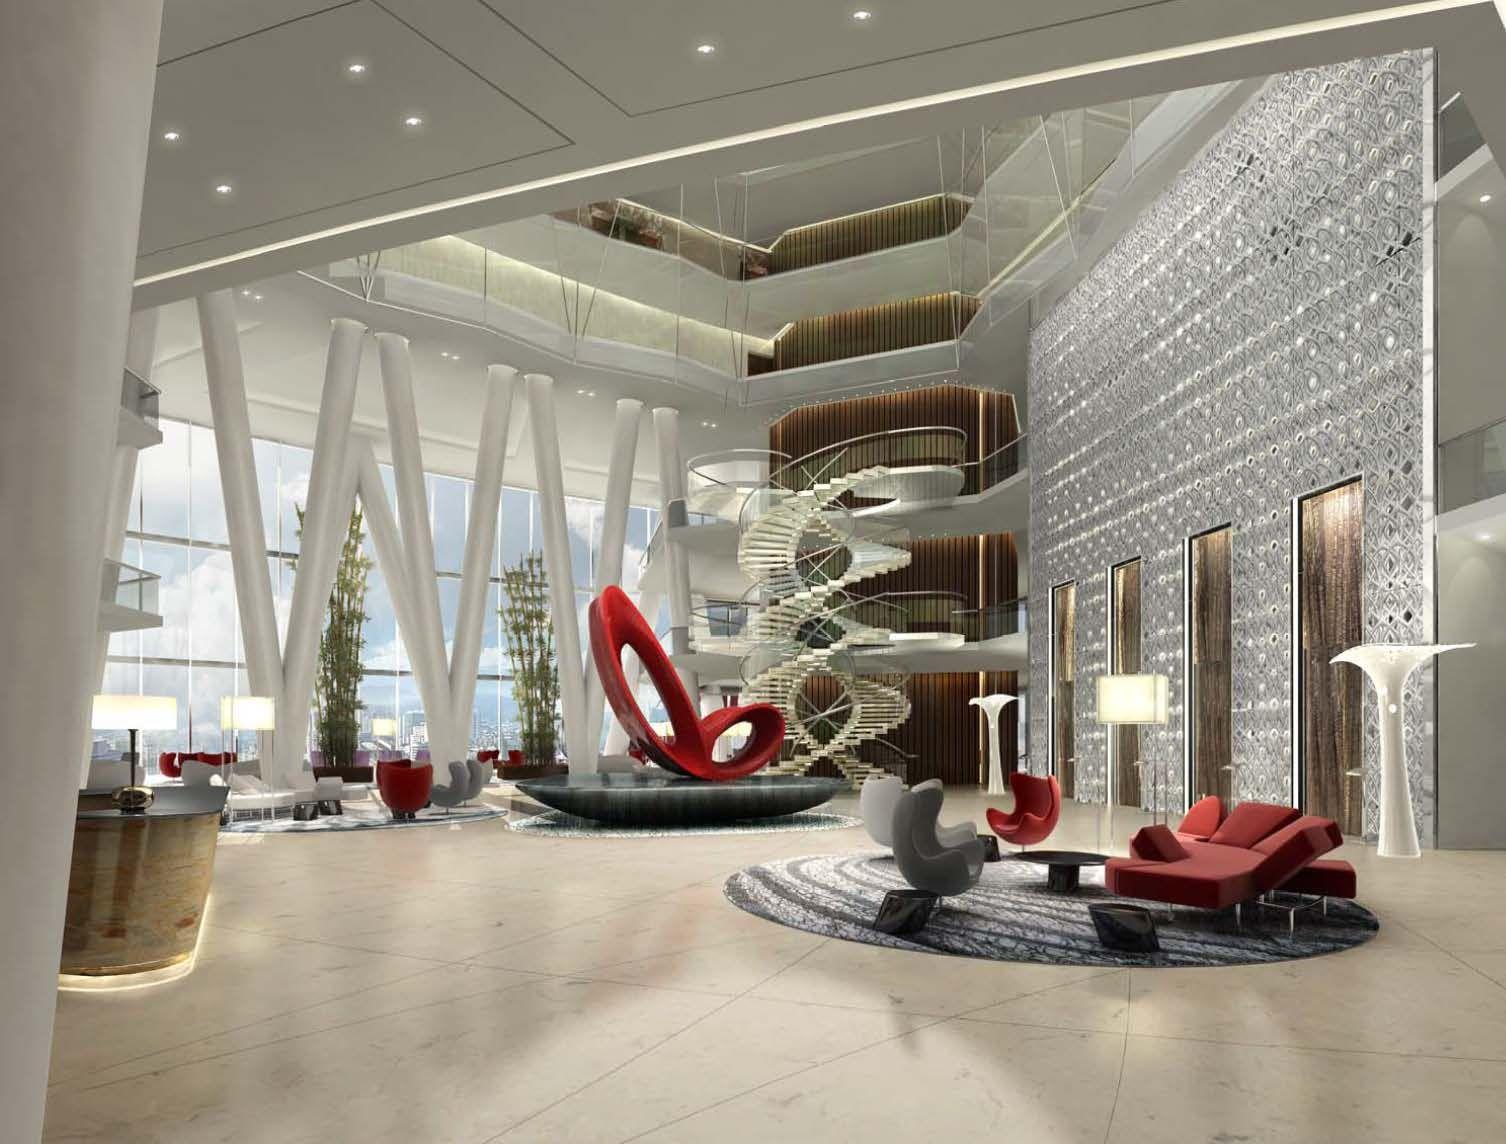 3d rendering luxury hotel lobby china luxury china hotel lobby - Sky Lobby At Four Seasons Hotel Guangzhou Designed By Hba Hirsch Bedner Associates